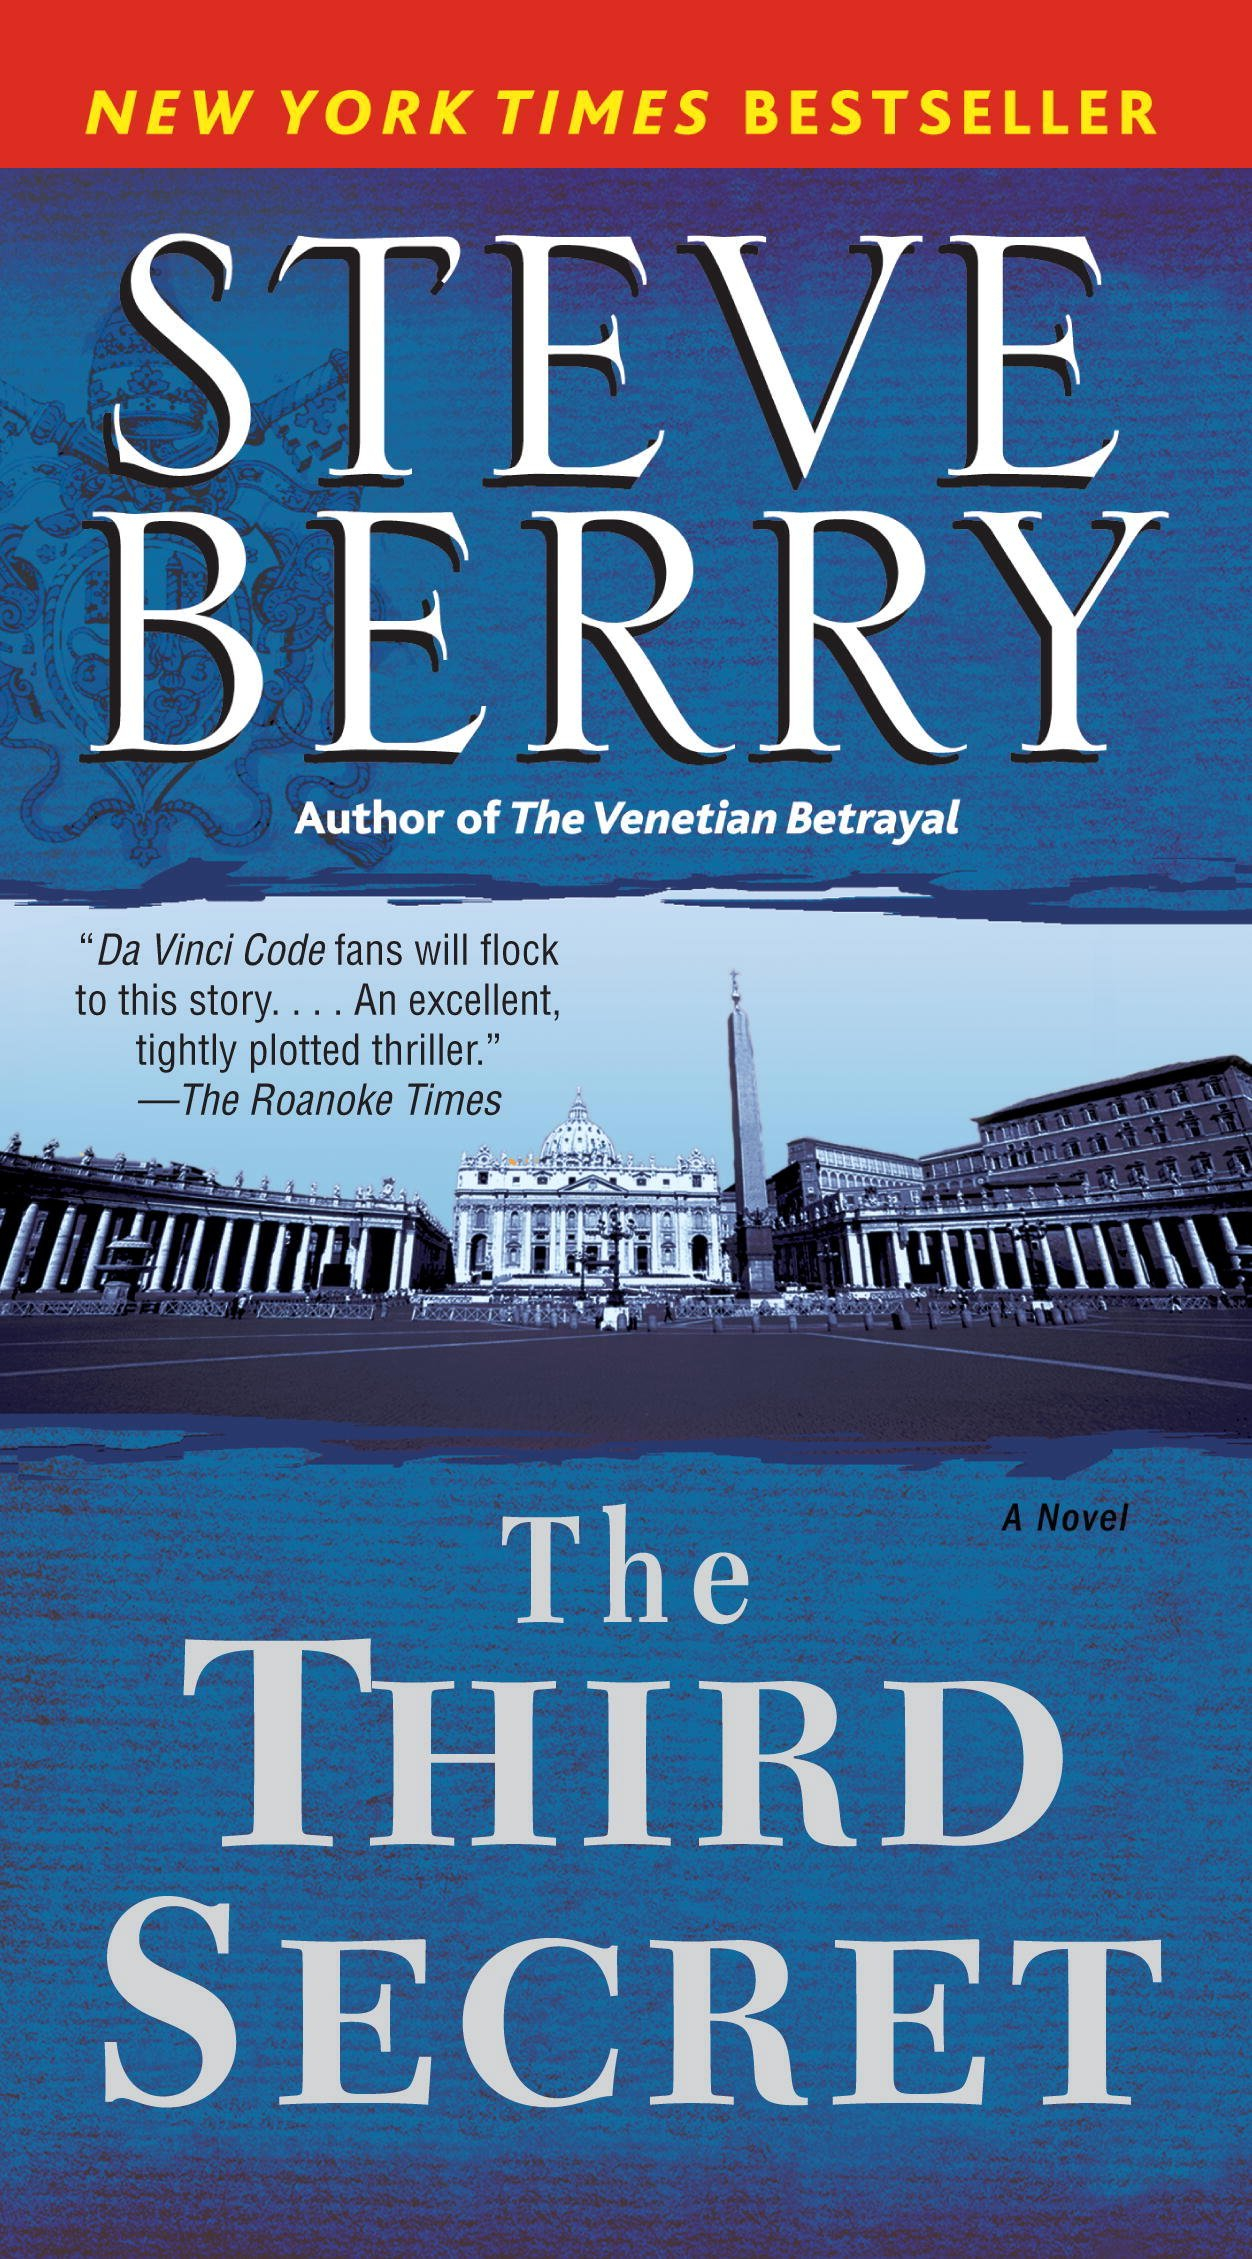 The Third Secret: A Novel of Suspense